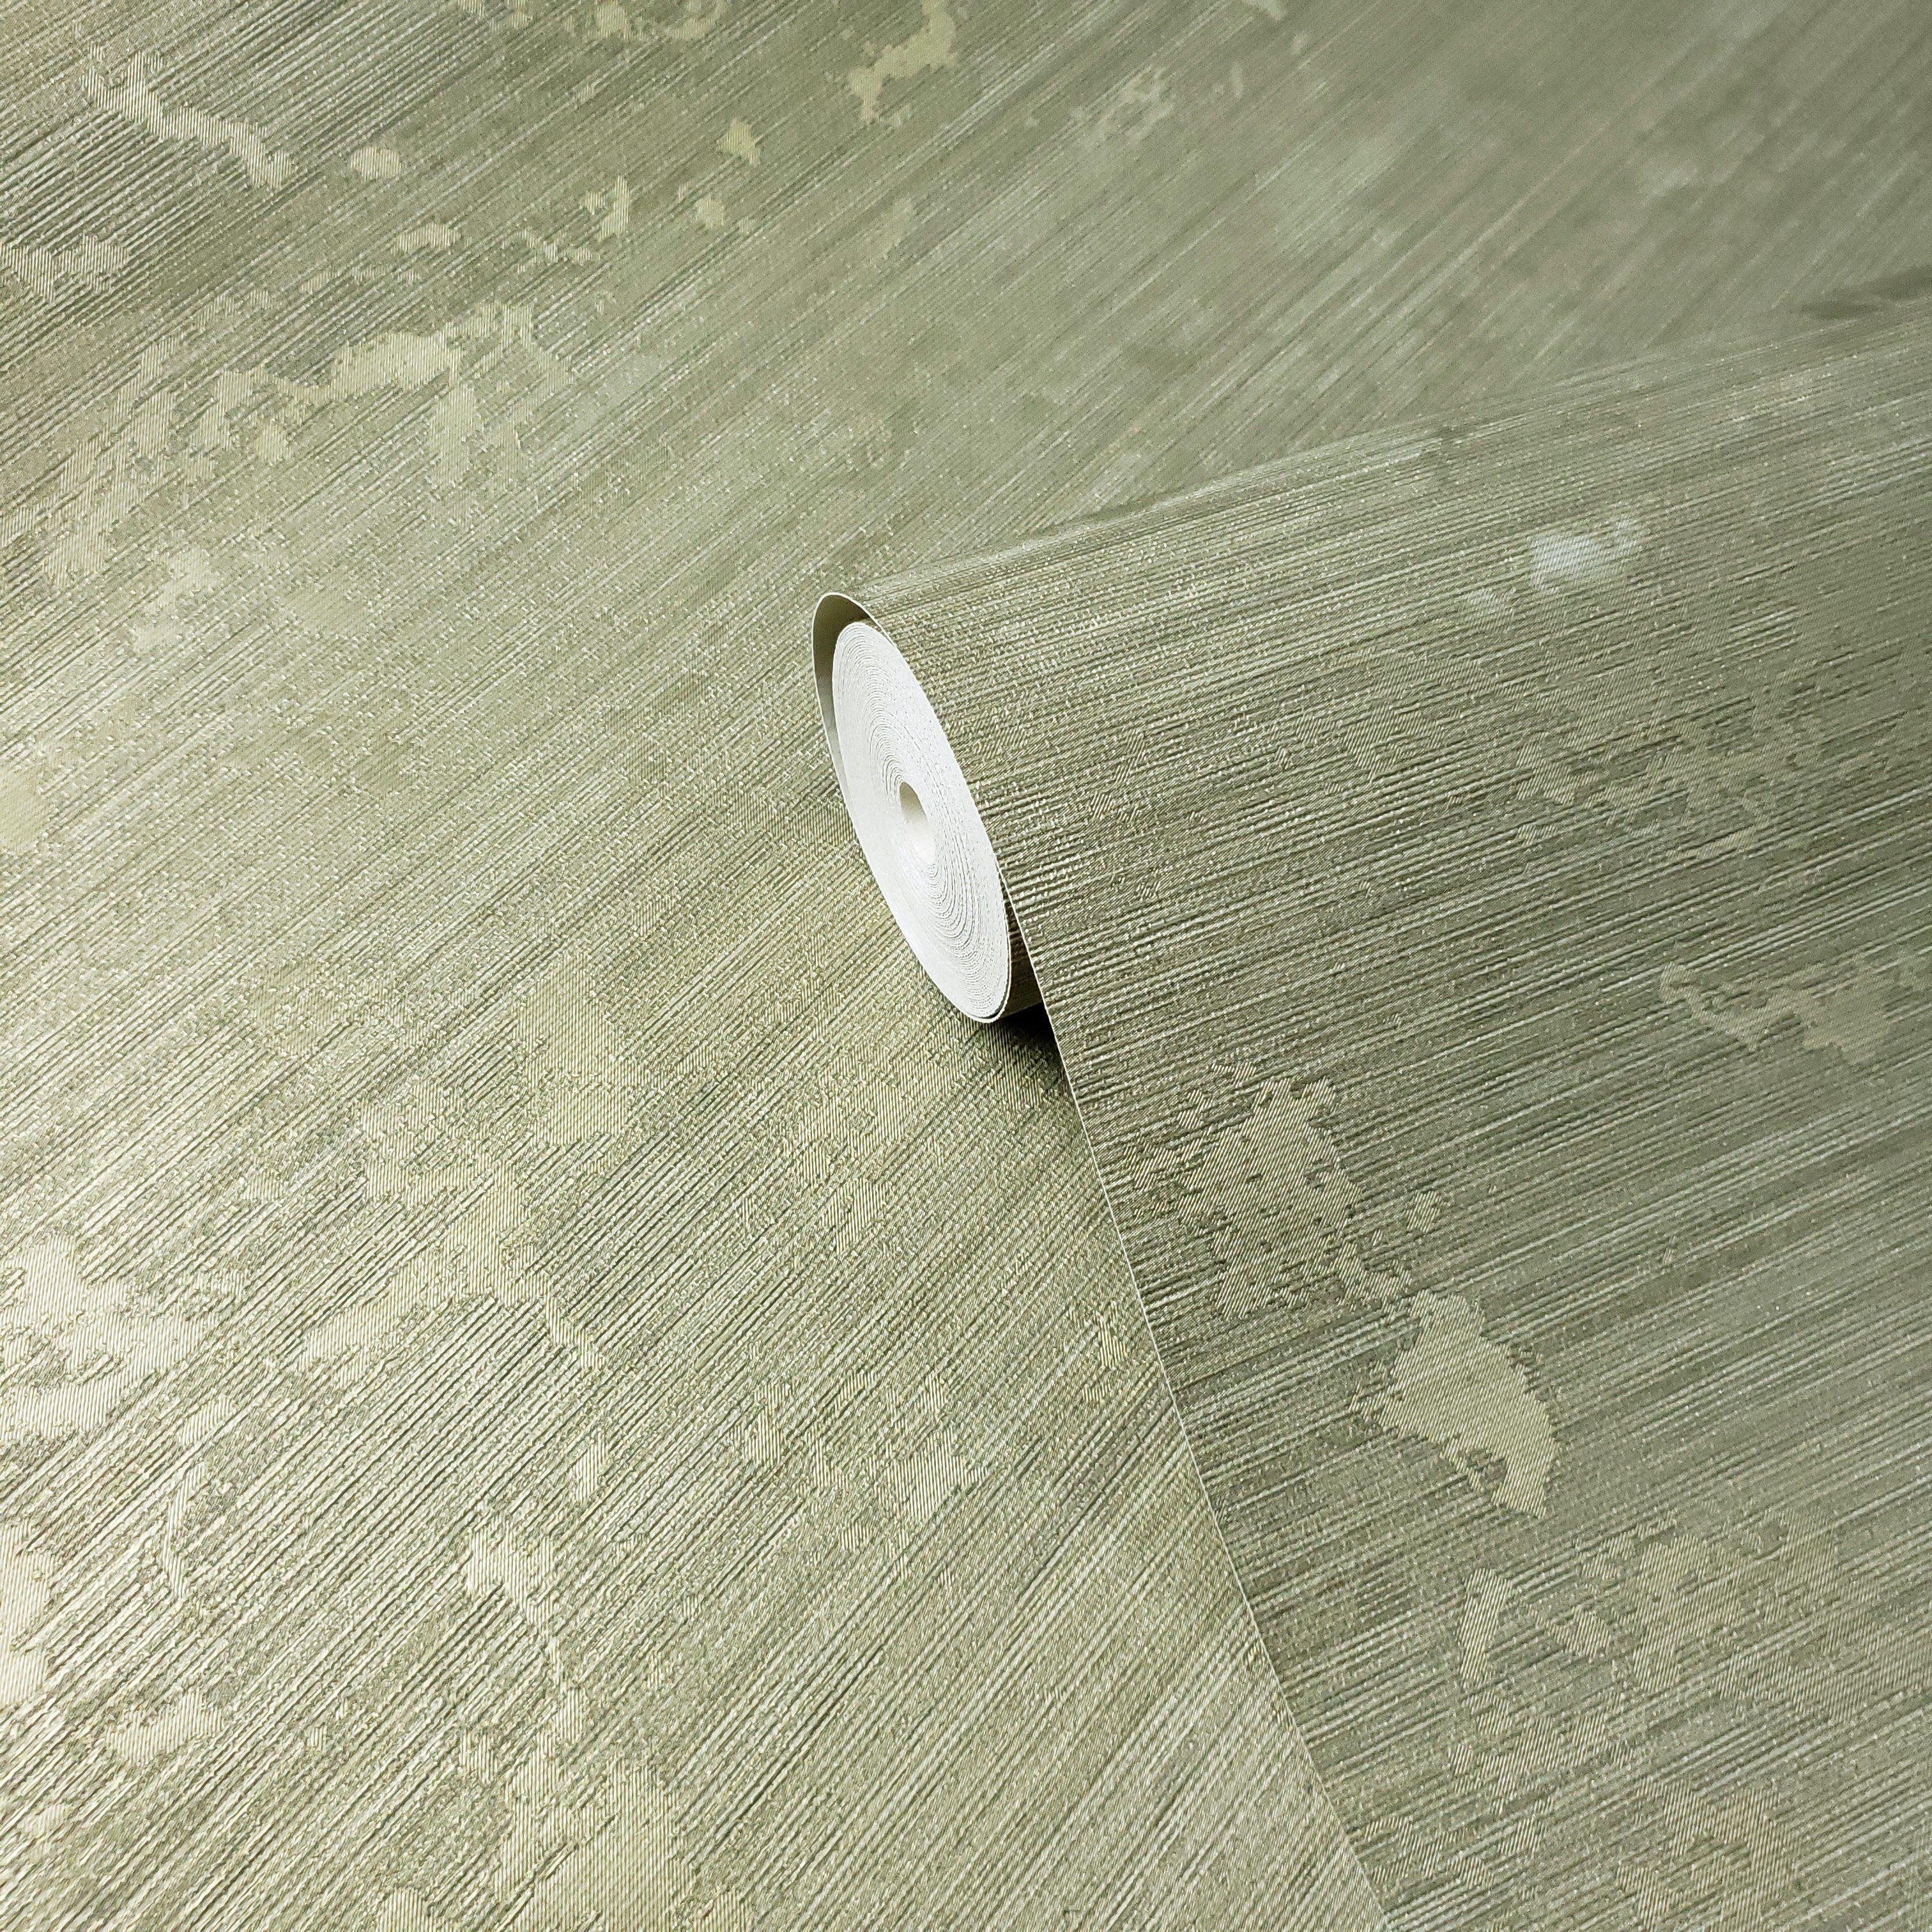 600014 Wallpaper Olive Green Metallic Textured Plain faux